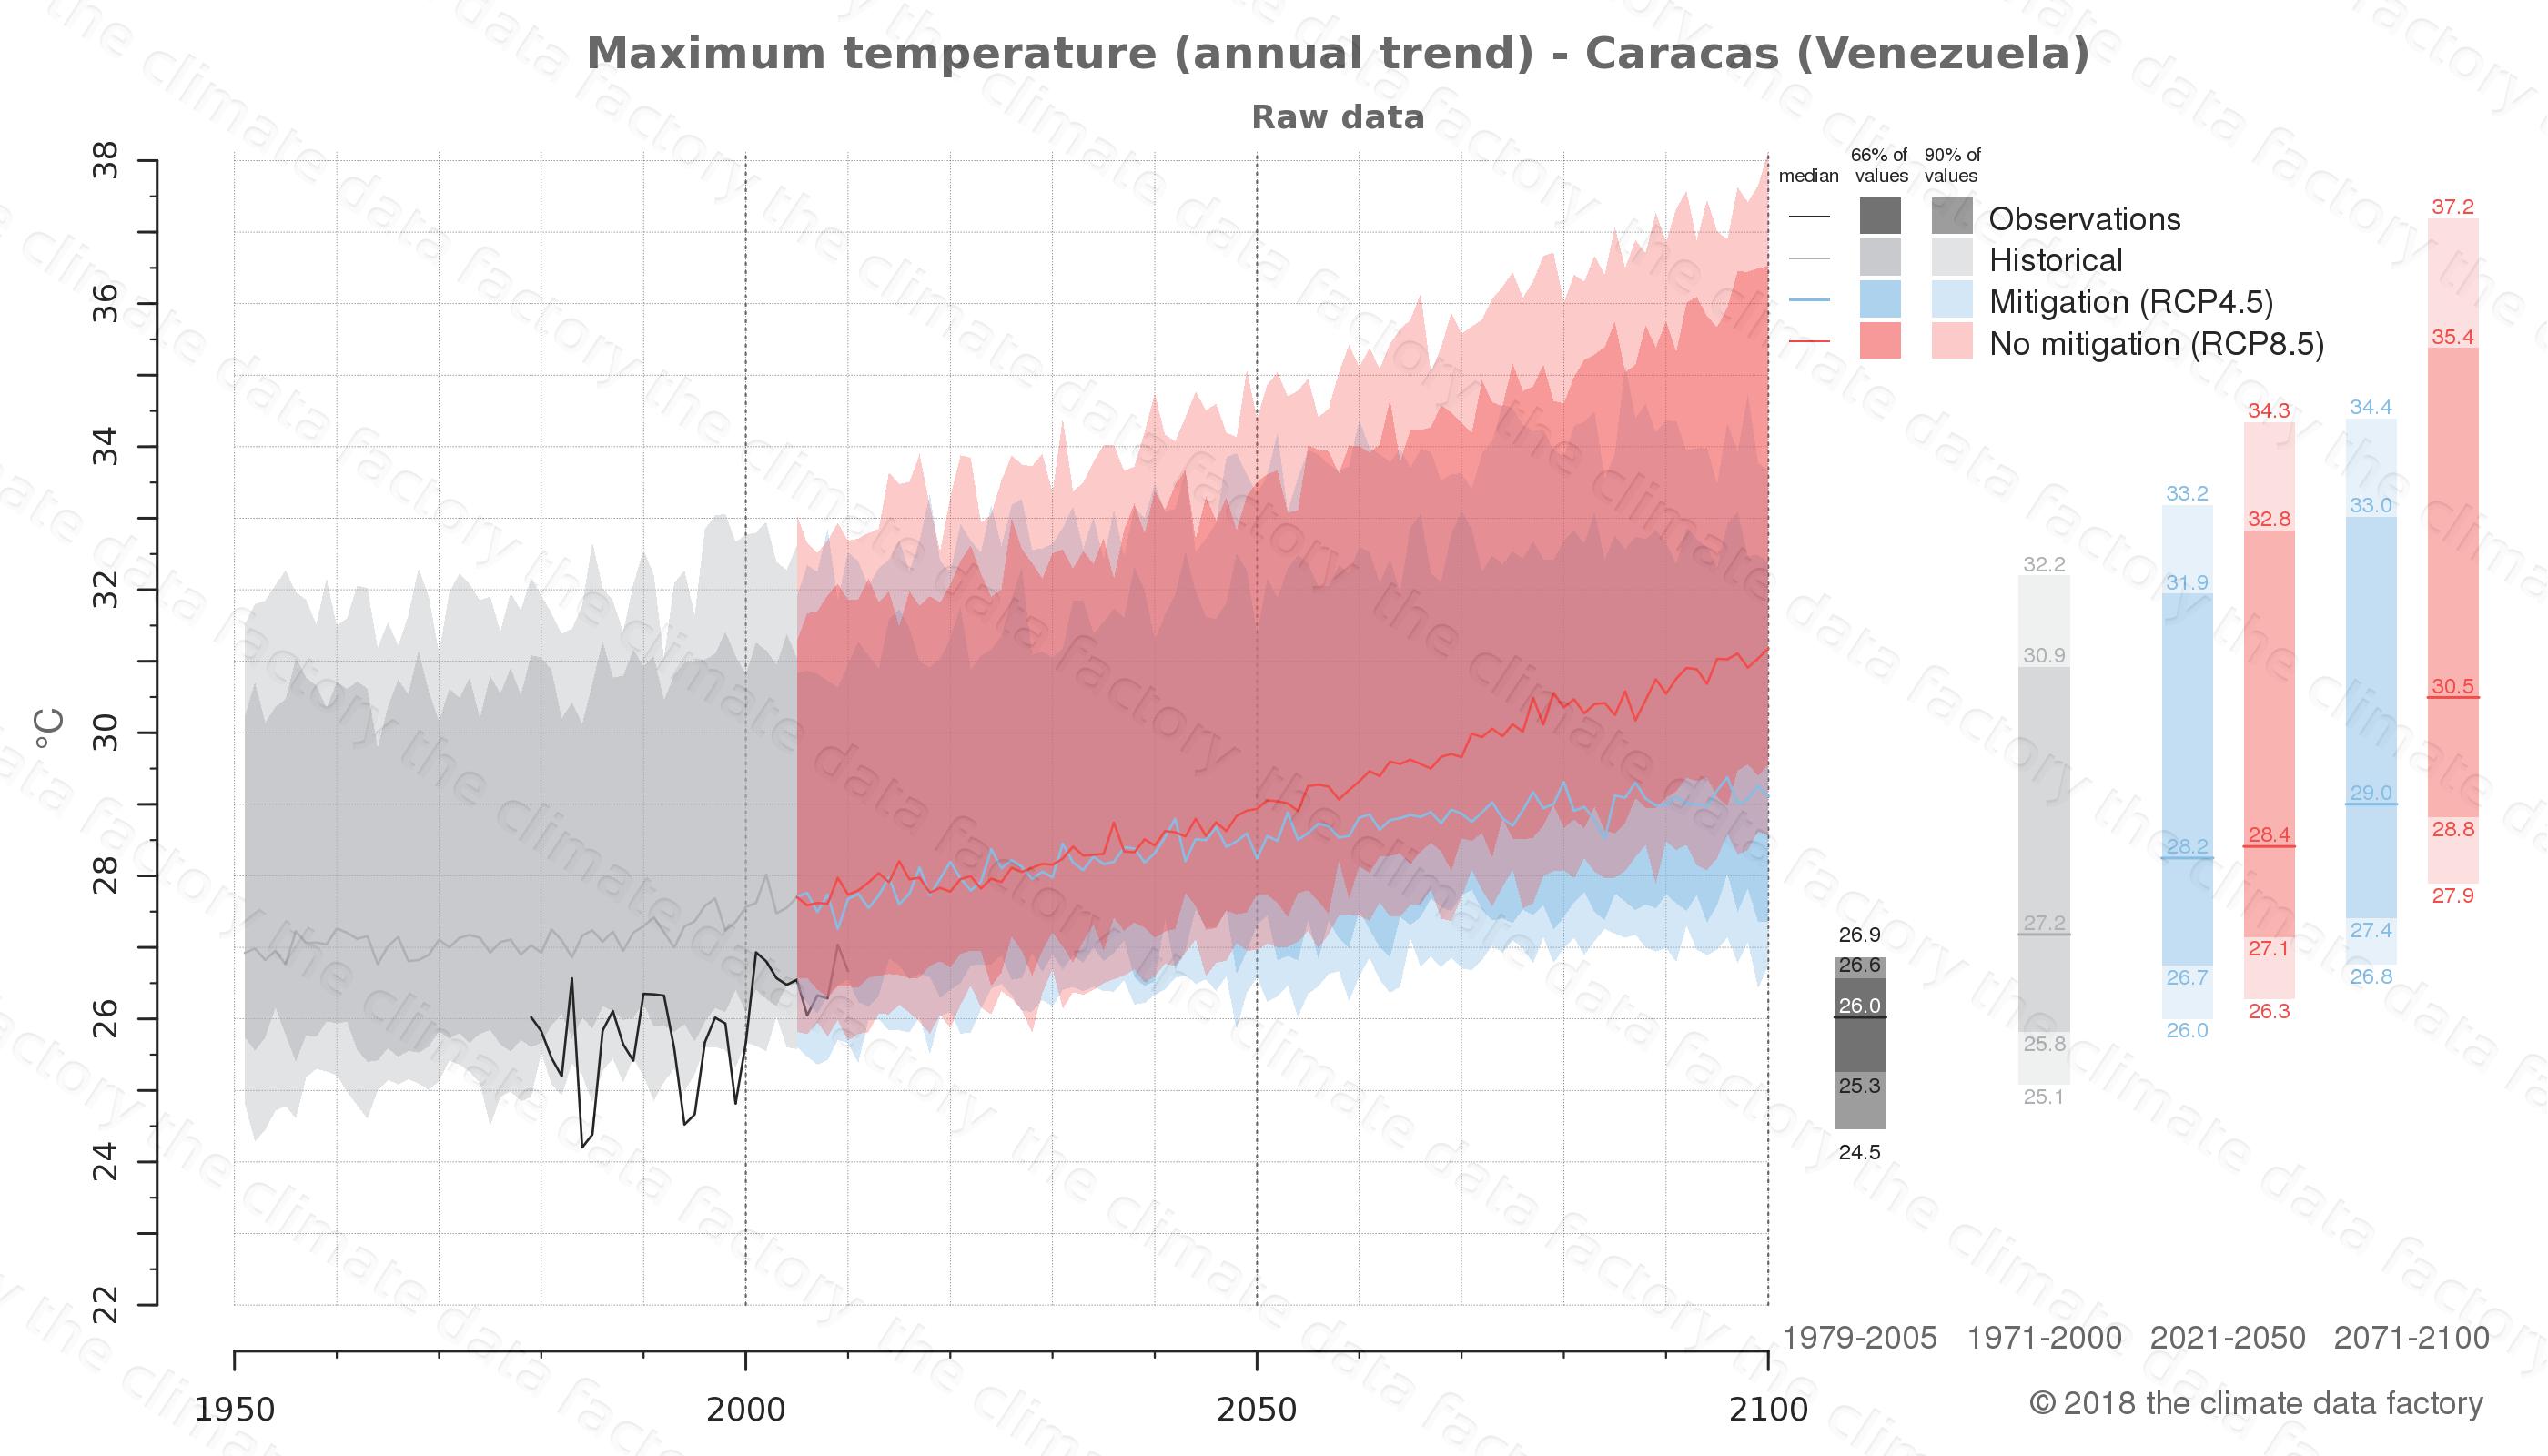 climate change data policy adaptation climate graph city data maximum-temperature caracas venezuela